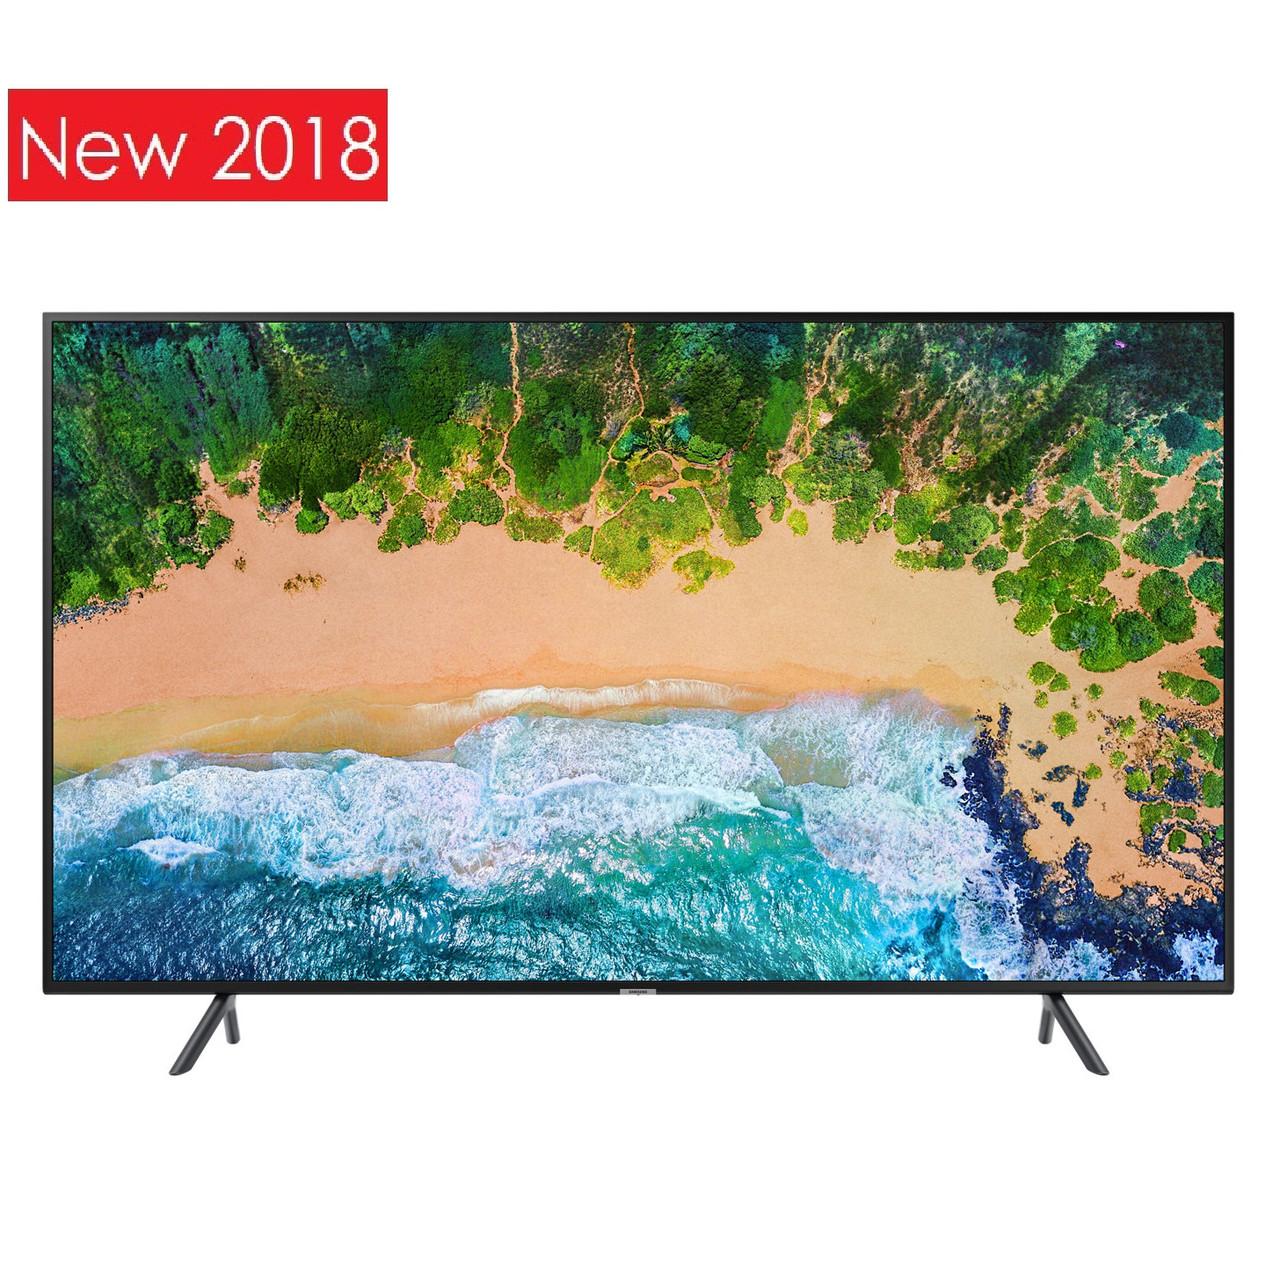 Телевизор Samsung UE49NU7102 (PQI 1300Гц, UltraHD HDR10, Smart, Tizen 4.0, DVB-C/T2)